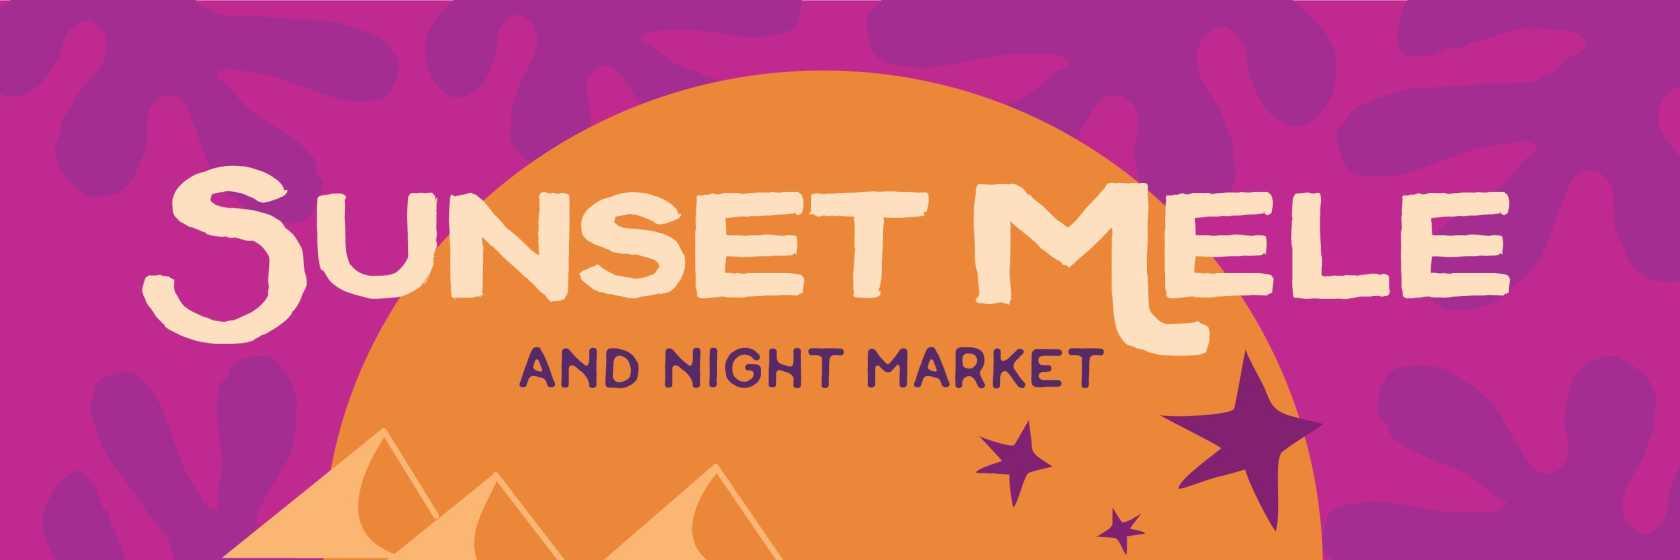 Sunset Mele and Night Mkt header